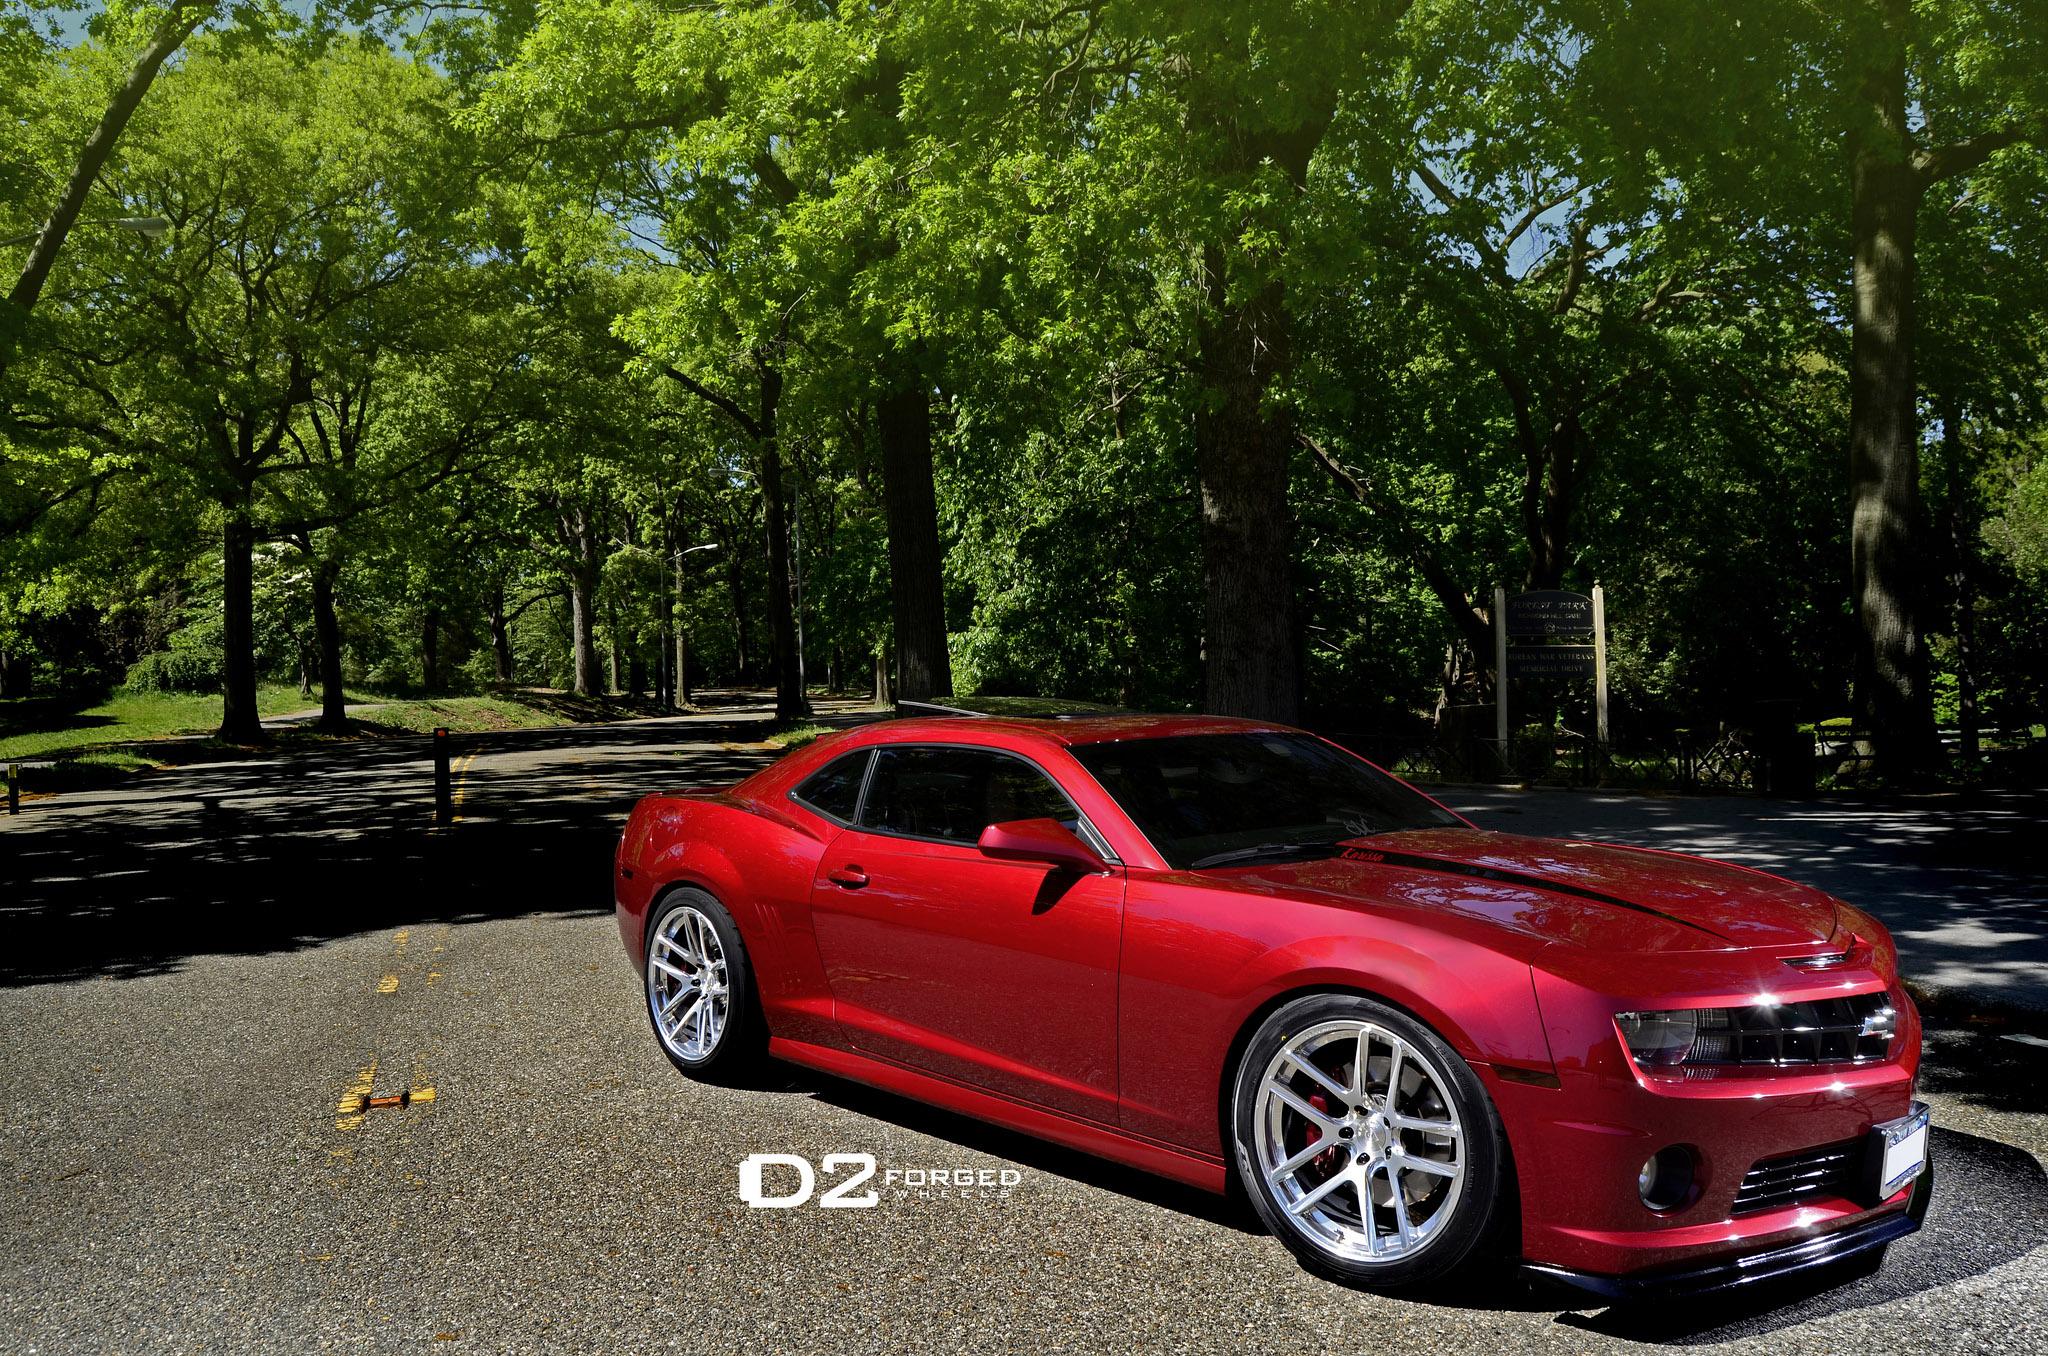 2014 Camaro V6 Turbo - Bing images